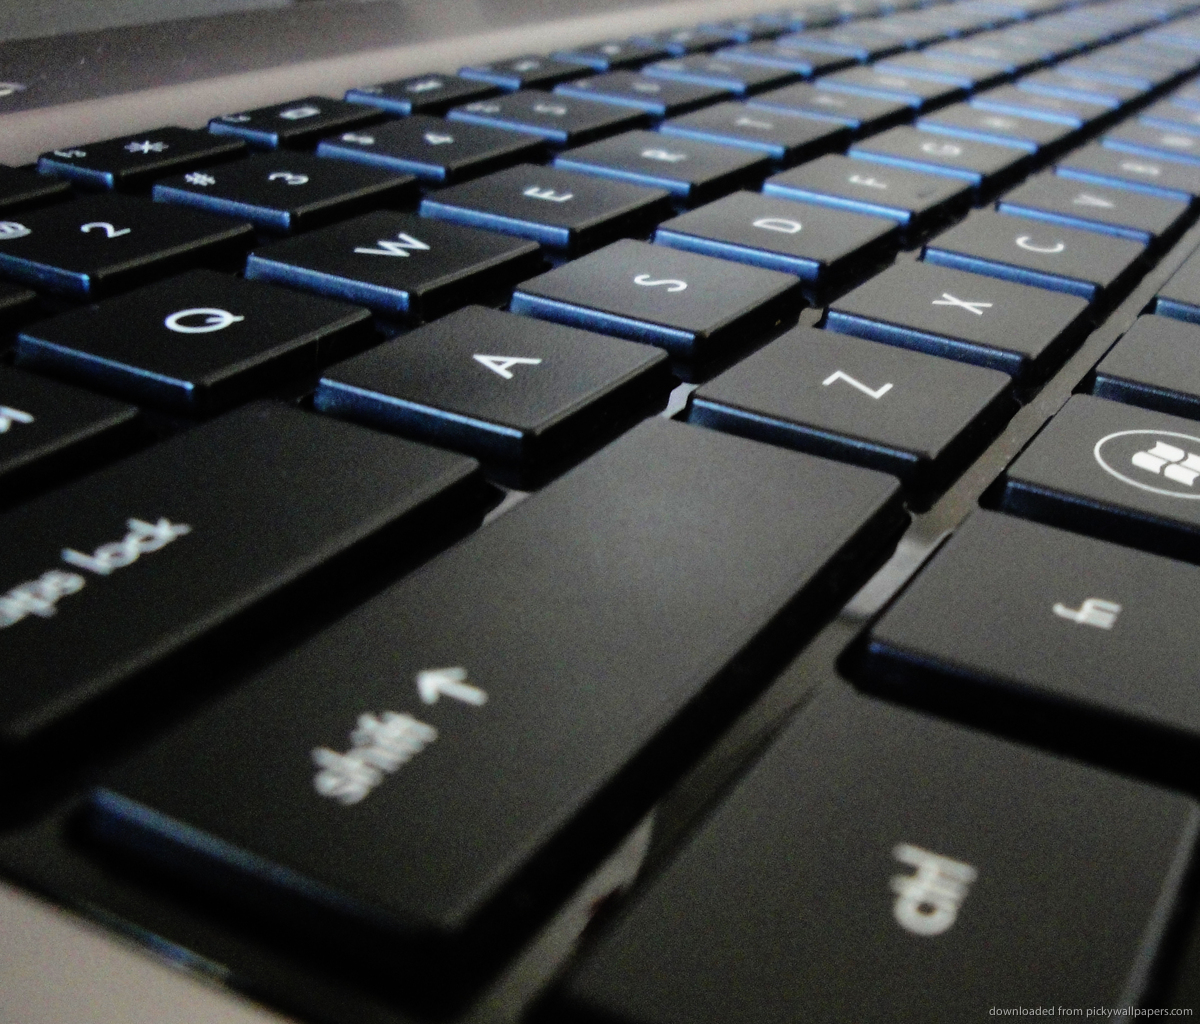 Download Wallpaper Hp Download HP Pavilion Keyboard Wallpap 1200x1024